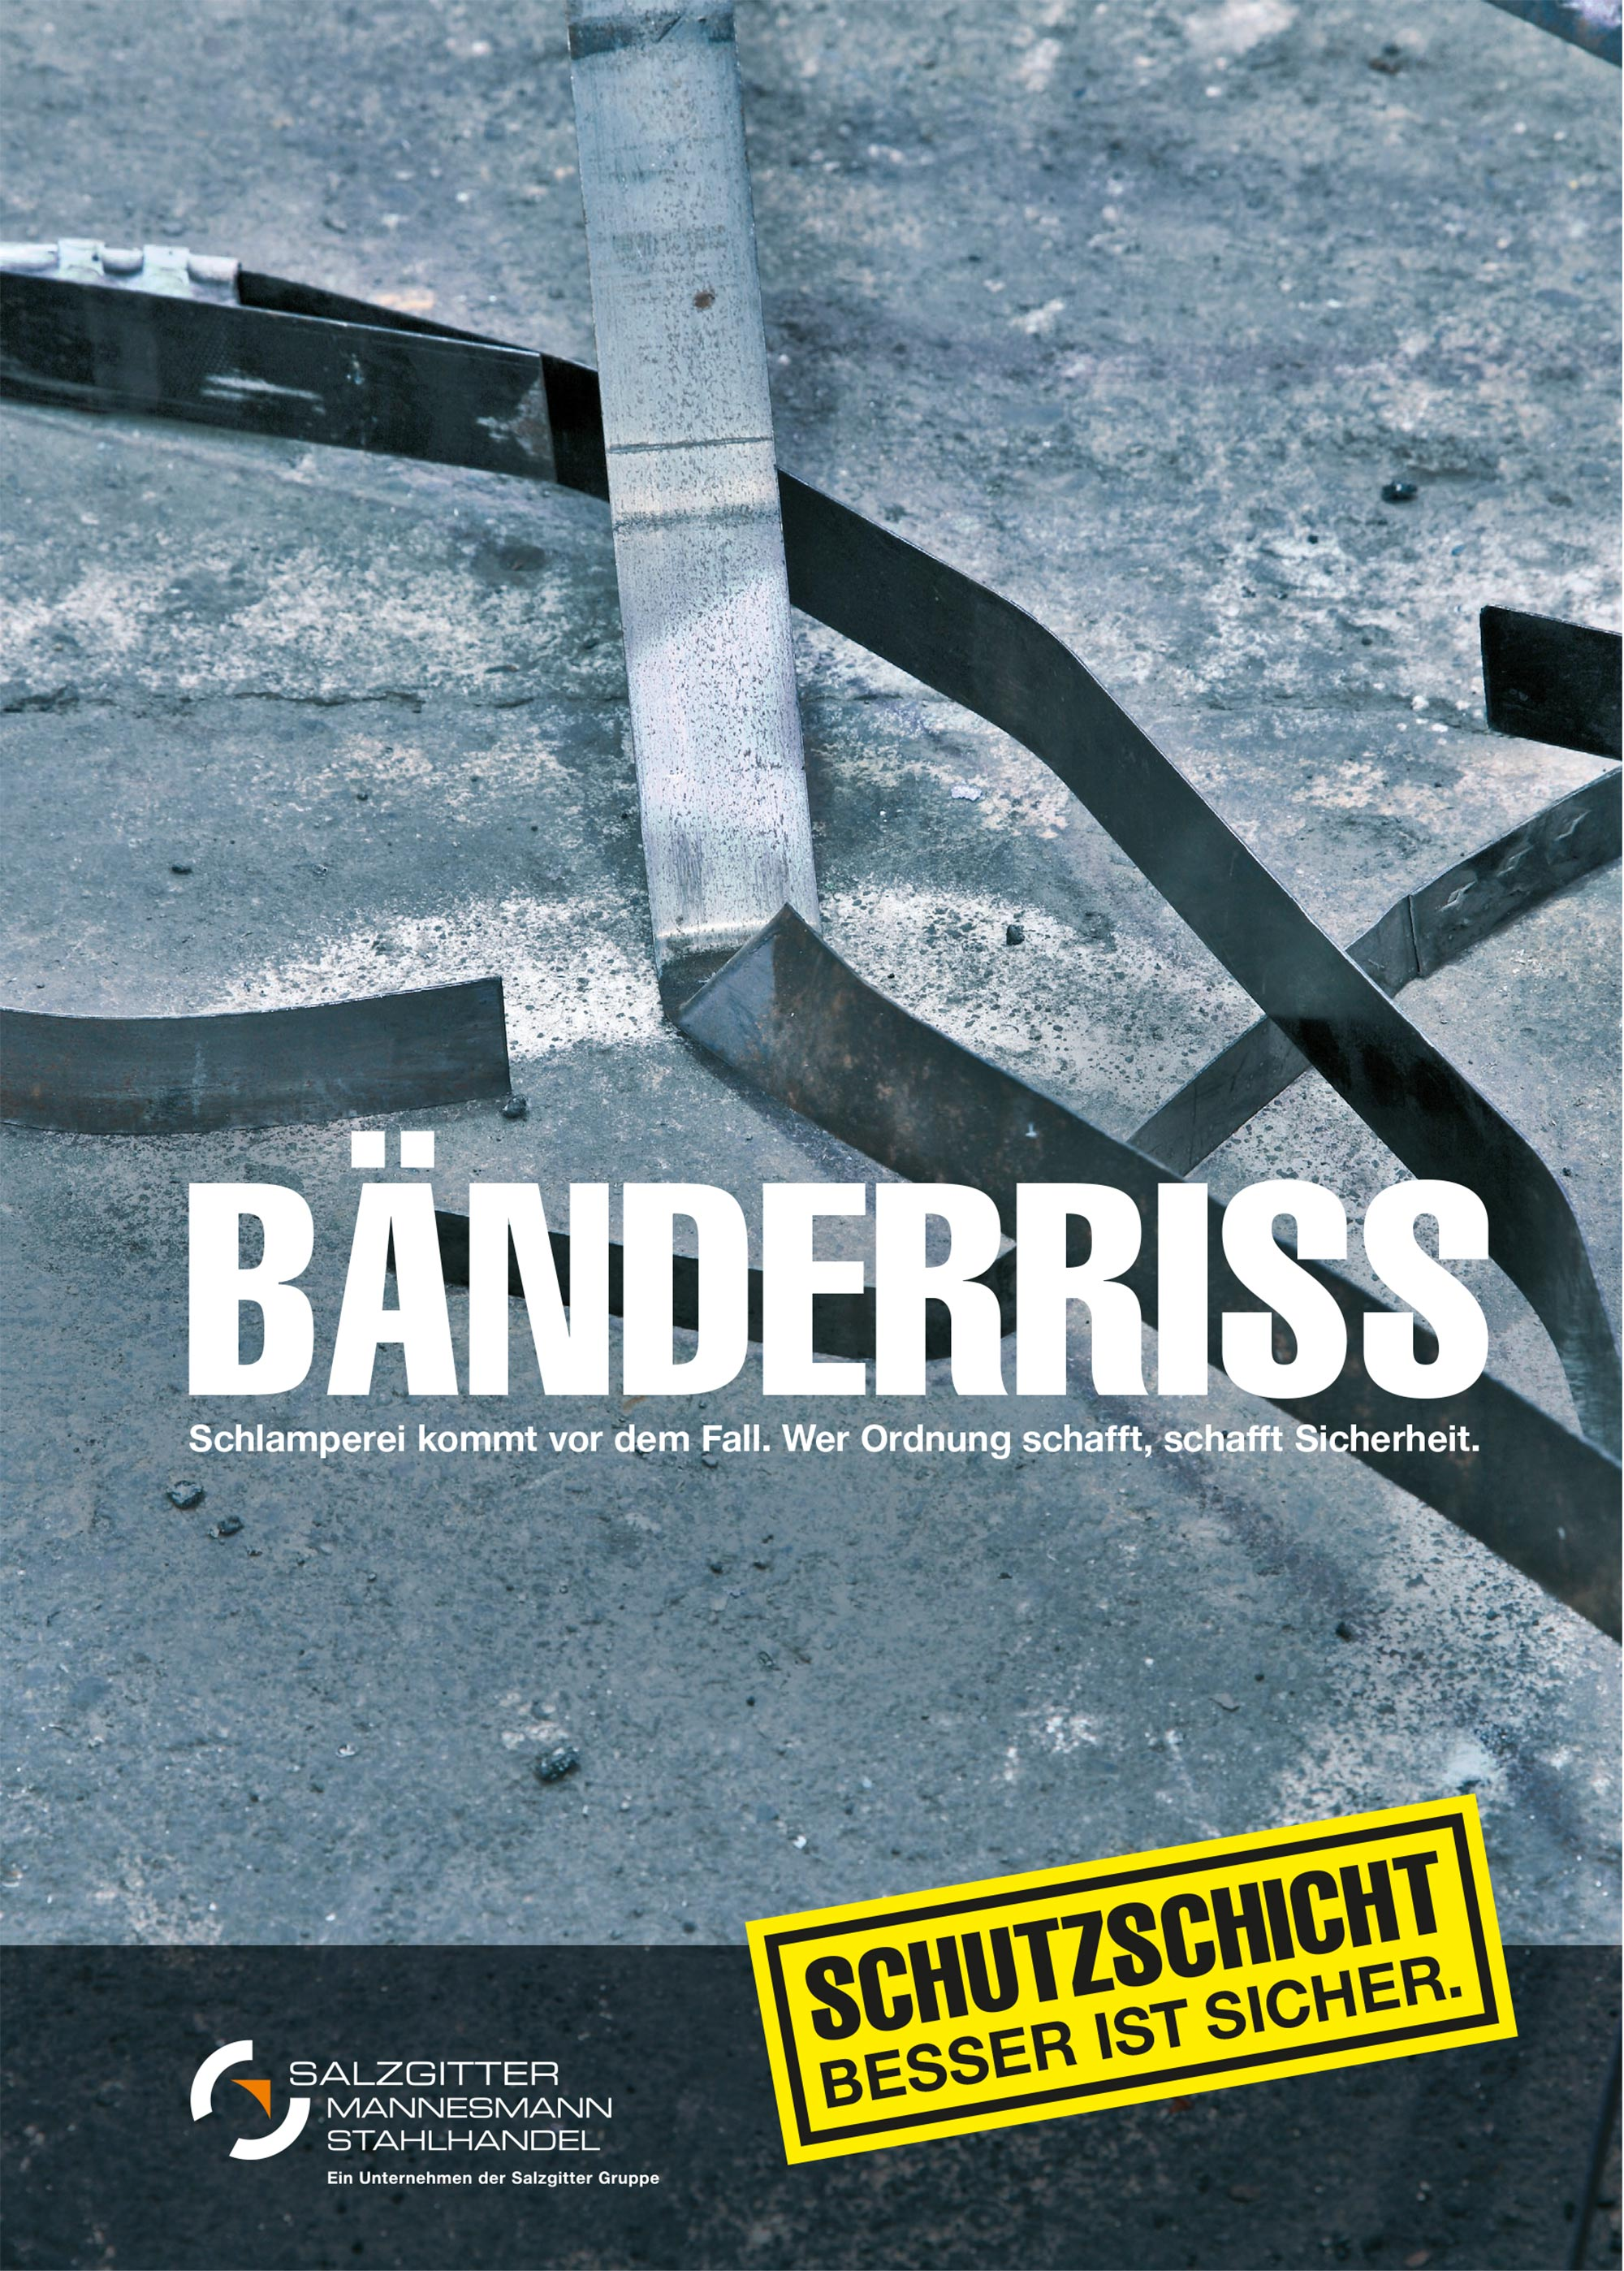 SMHD_Baenderriss